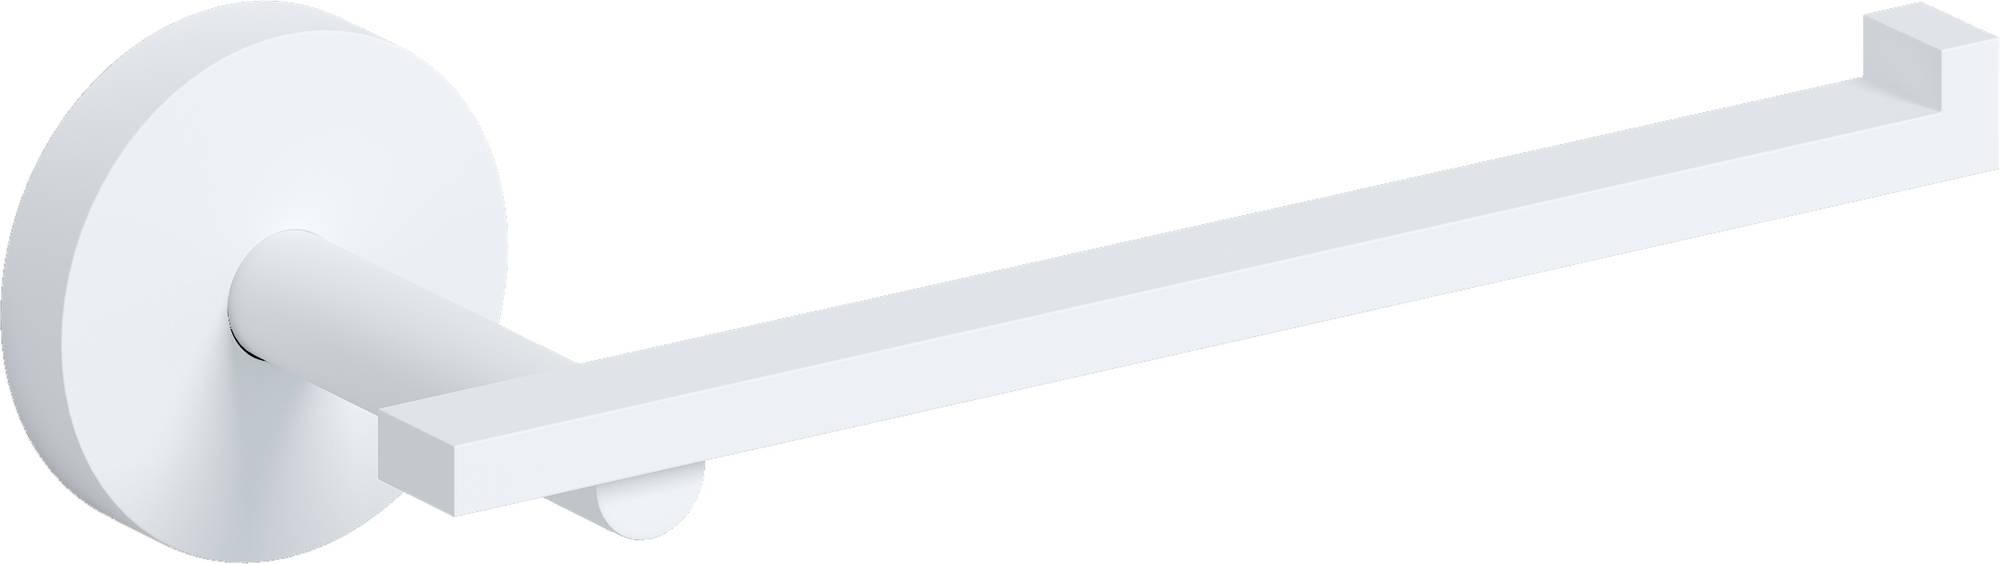 Toiletrolhouder Clou Flat Mat Wit 16.5x7.2x4.8cm